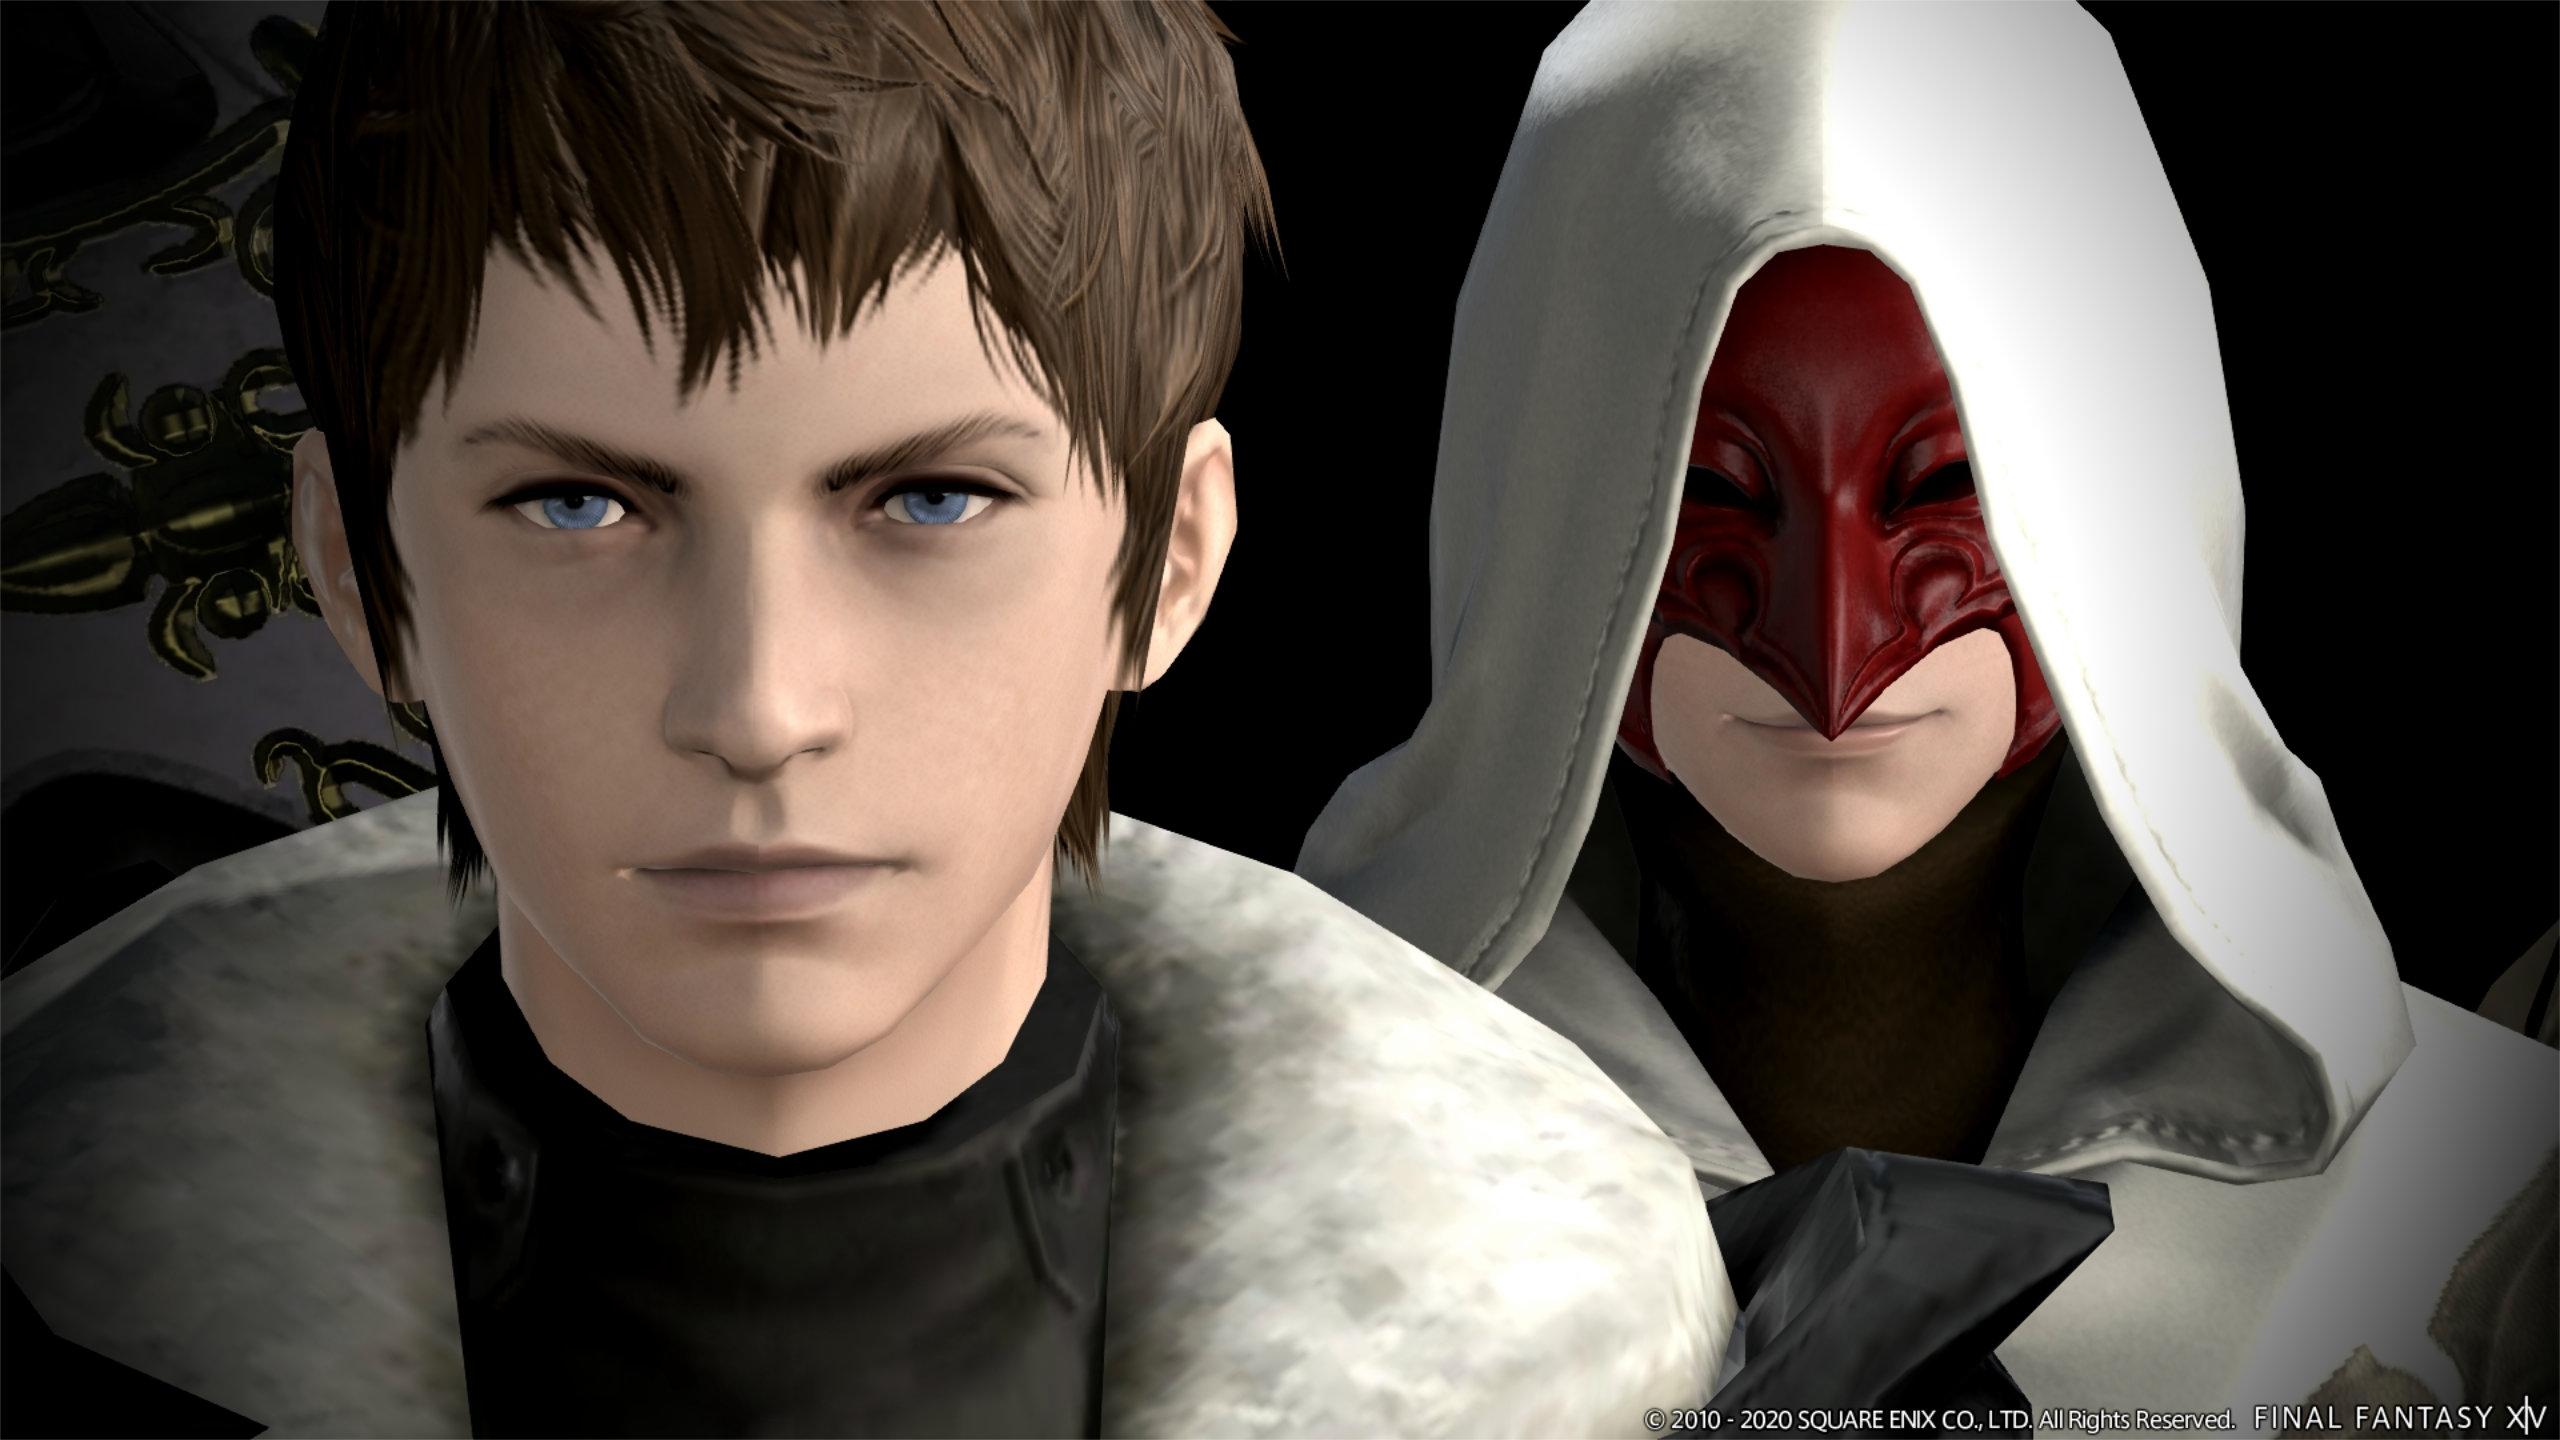 Screenshot From Final Fantasy XIV: Shadowbringers